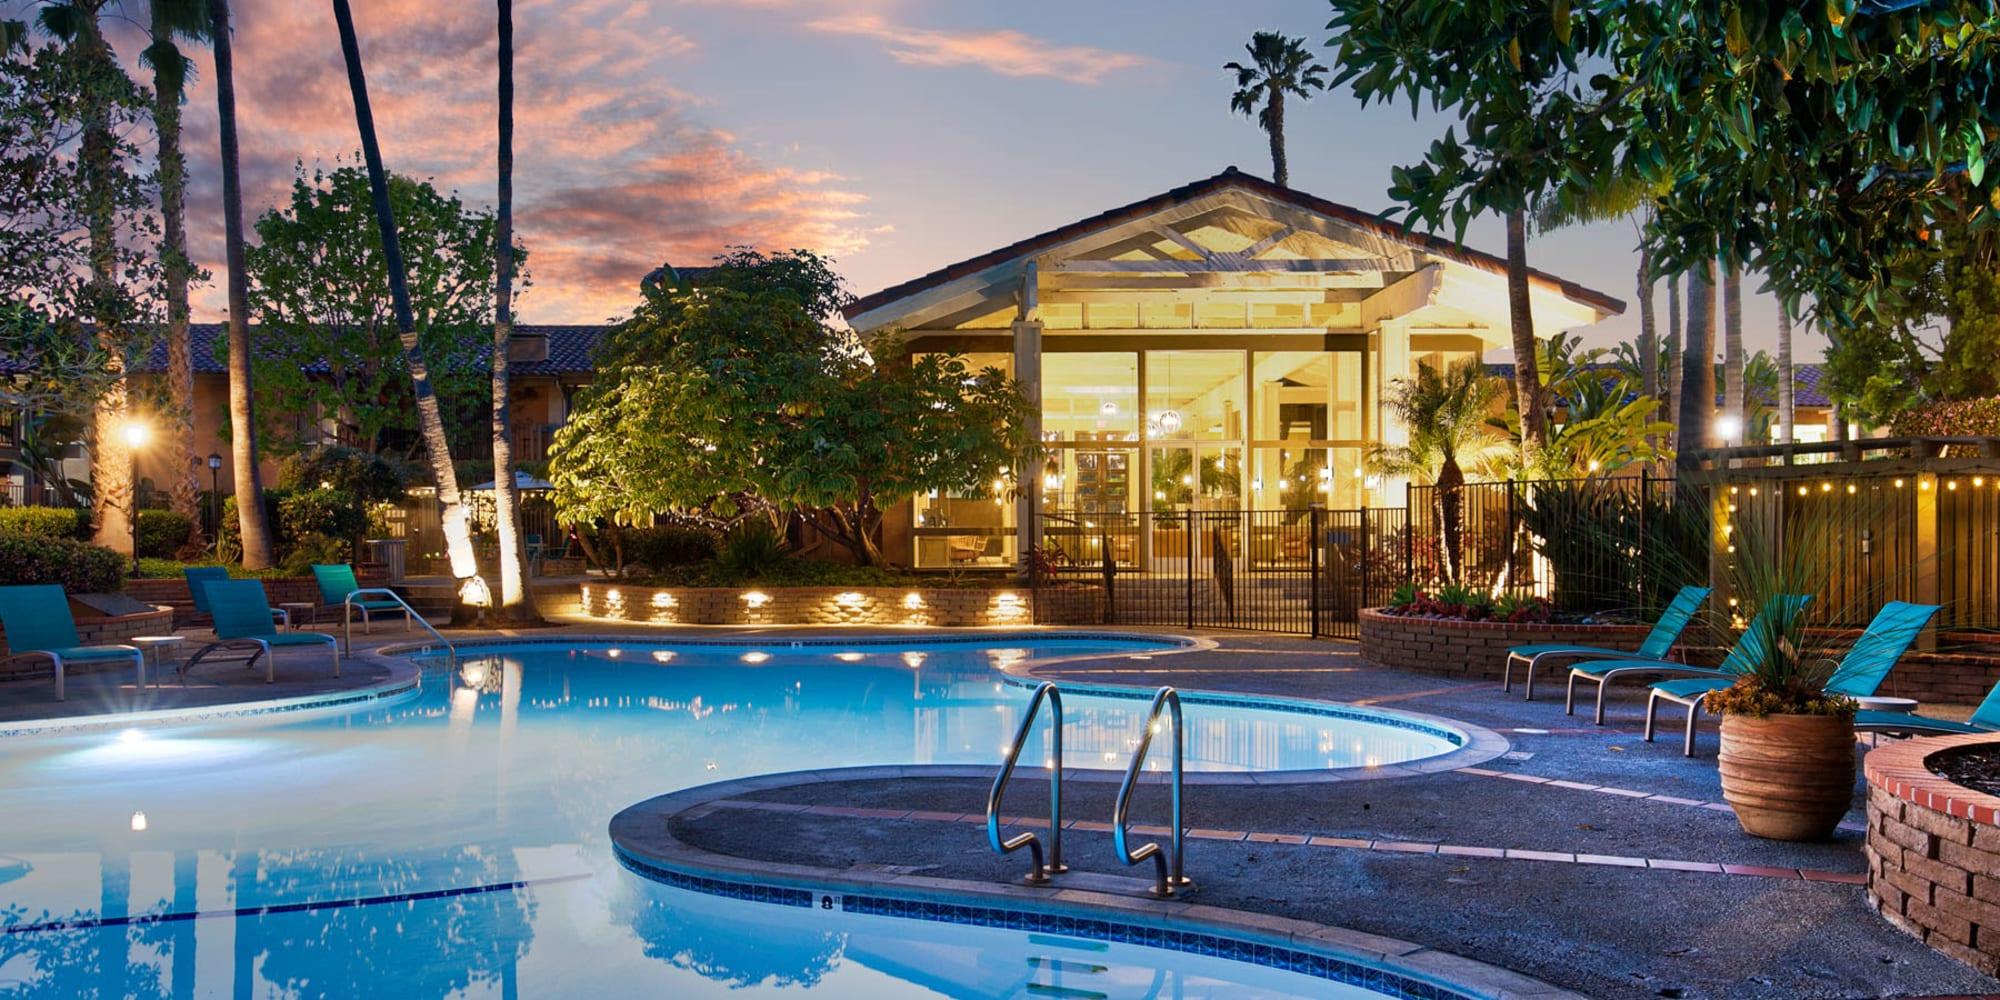 Underwater lights illuminating the swimming pool at twilight at Mediterranean Village Apartments in Costa Mesa, California